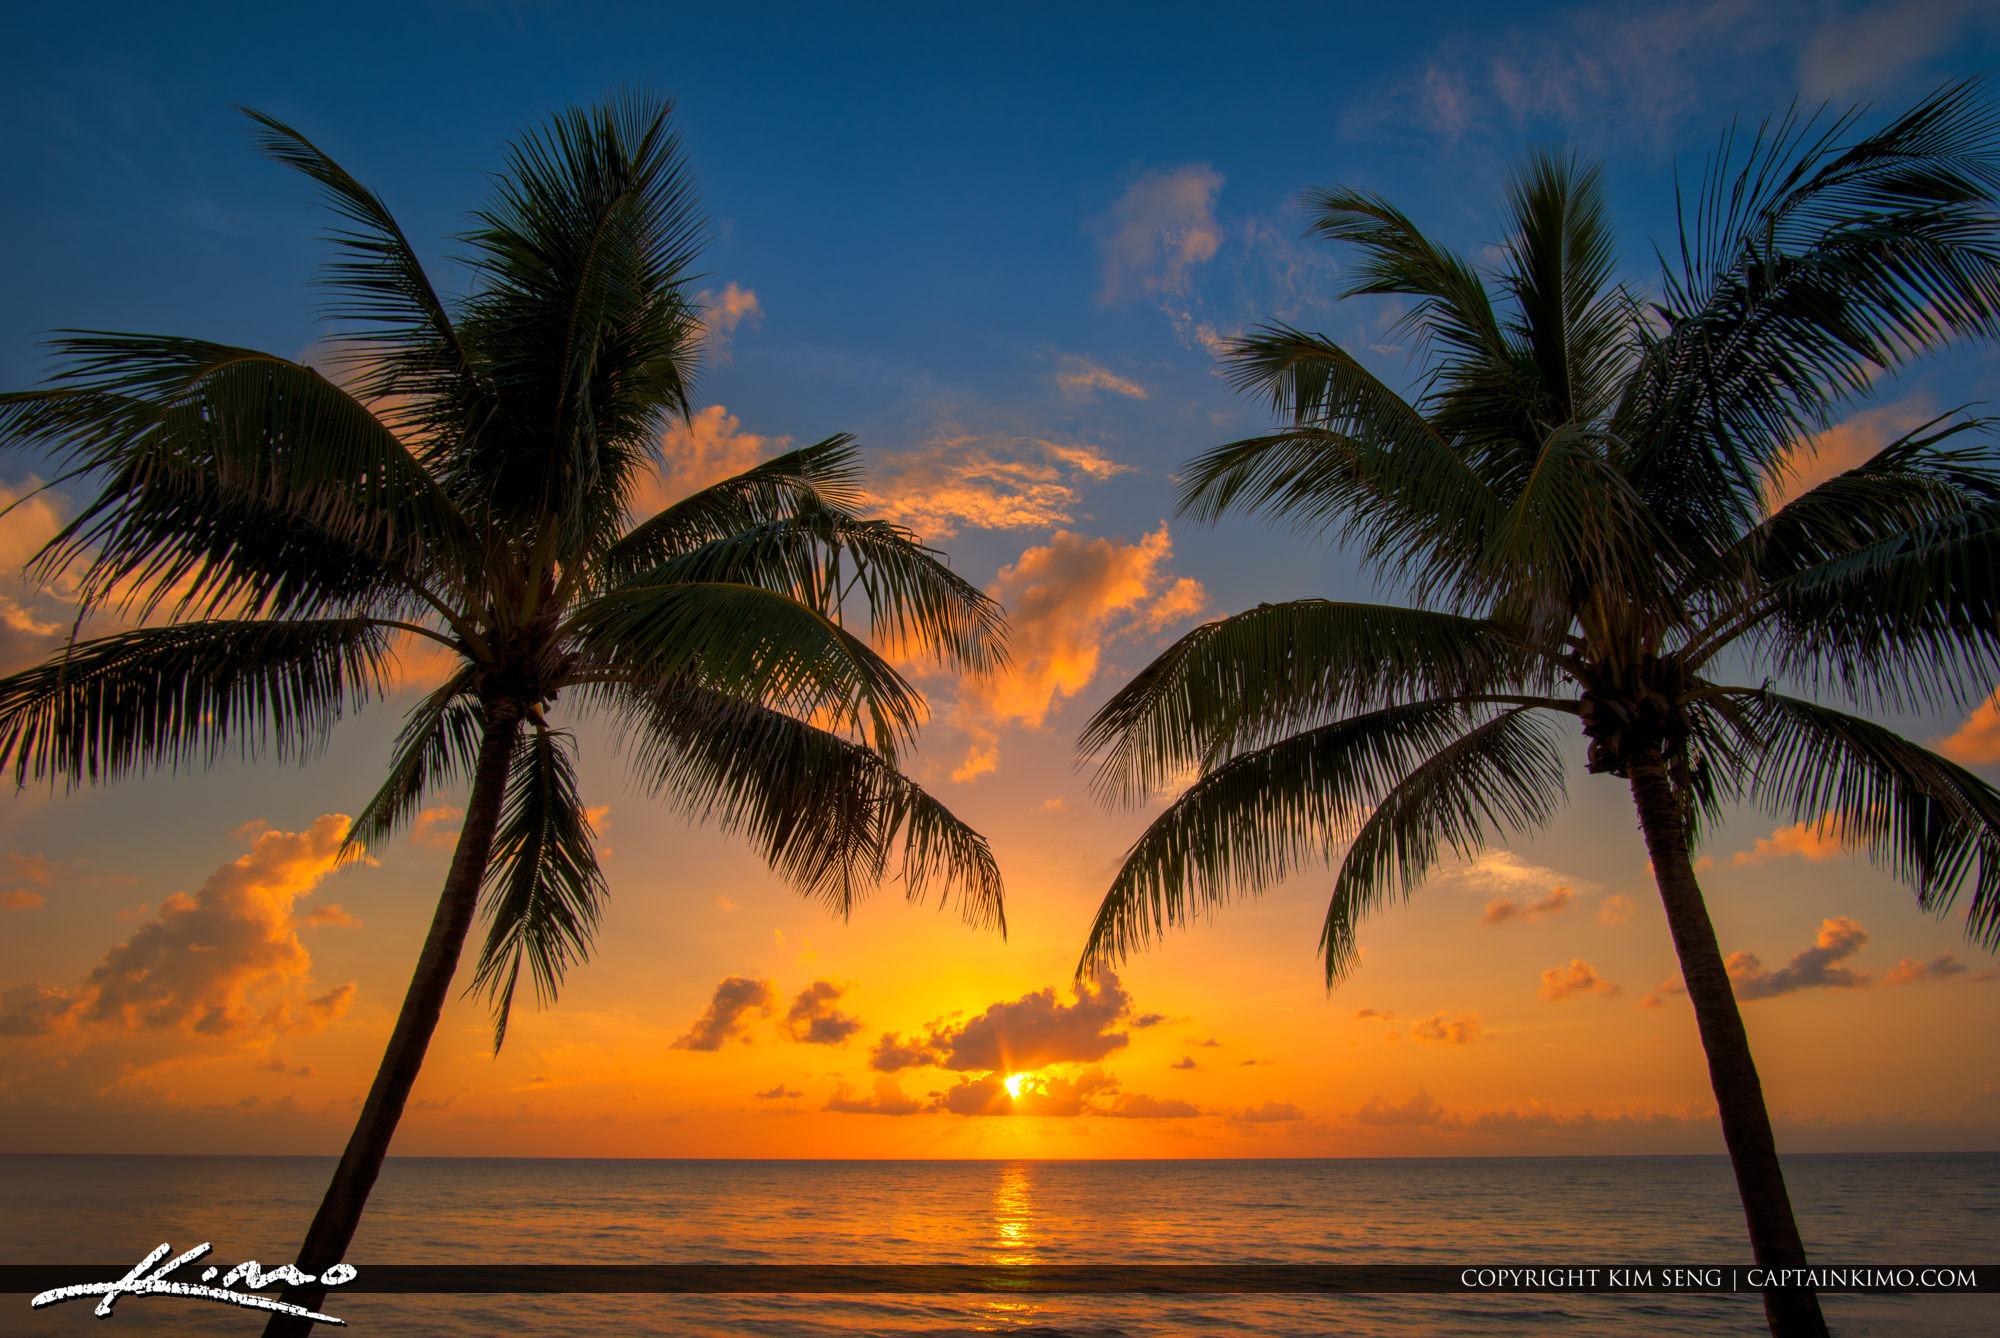 Coconut Tree Sunrise at the Beach